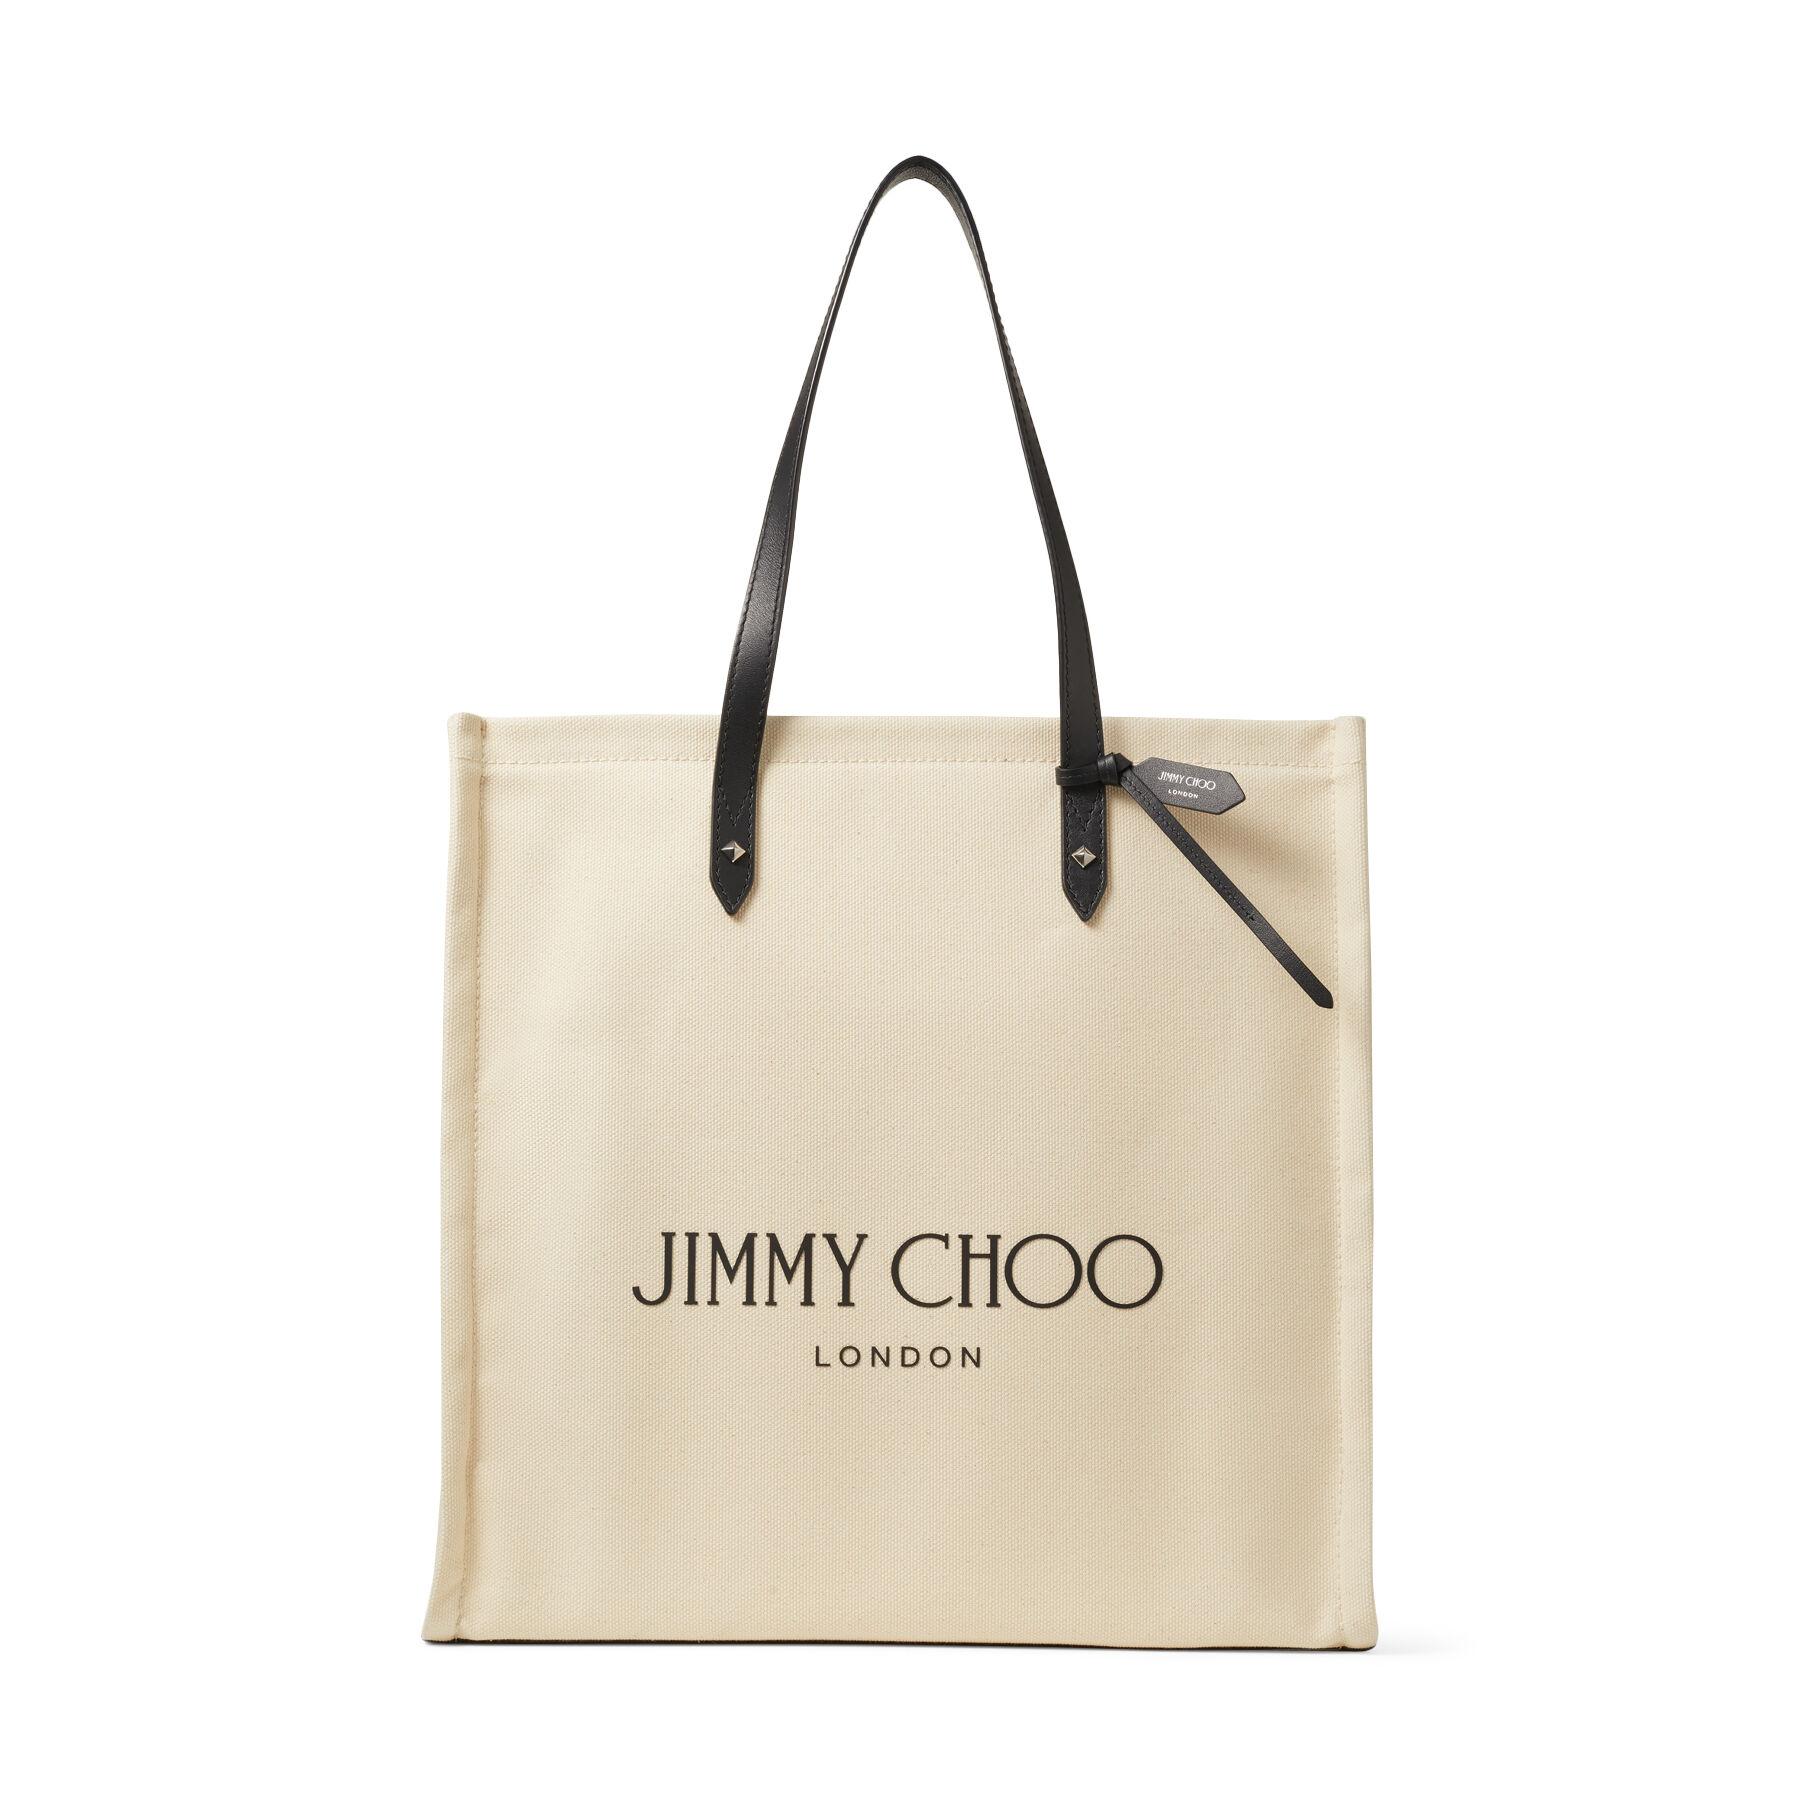 Jimmy Choo LOGO TOTE - image 7 of 8 in carousel